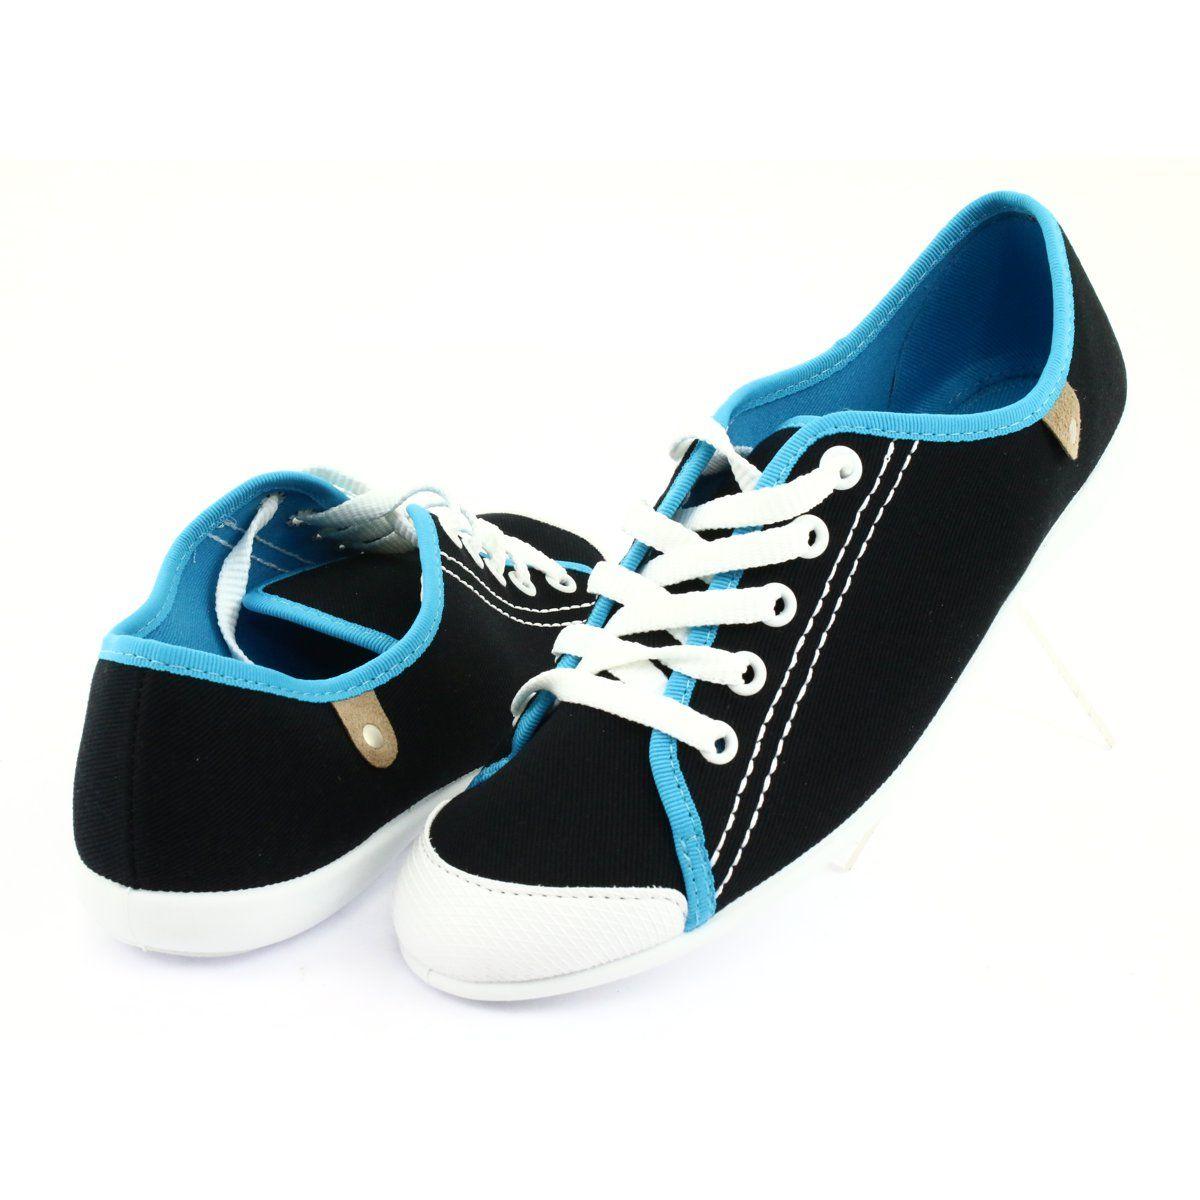 Befado Obuwie Mlodziezowe 248q019 Czarne Niebieskie Sneakers Baby Shoes Tretorn Sneaker